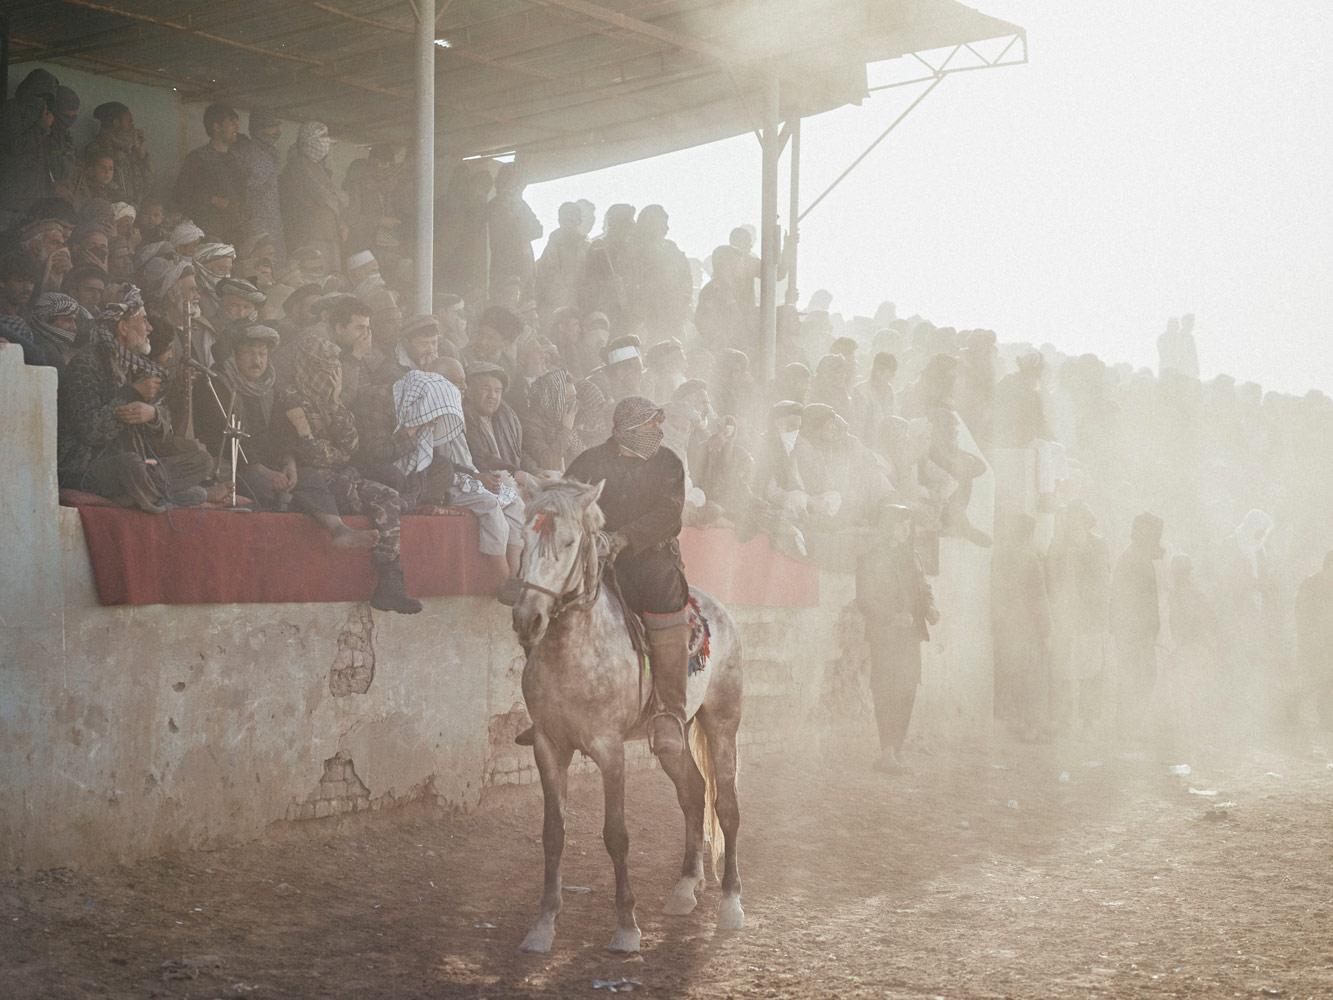 Buzkashi, © Balazs Gardi, 1st Place, Sport : Professional, Sony World Photography Awards